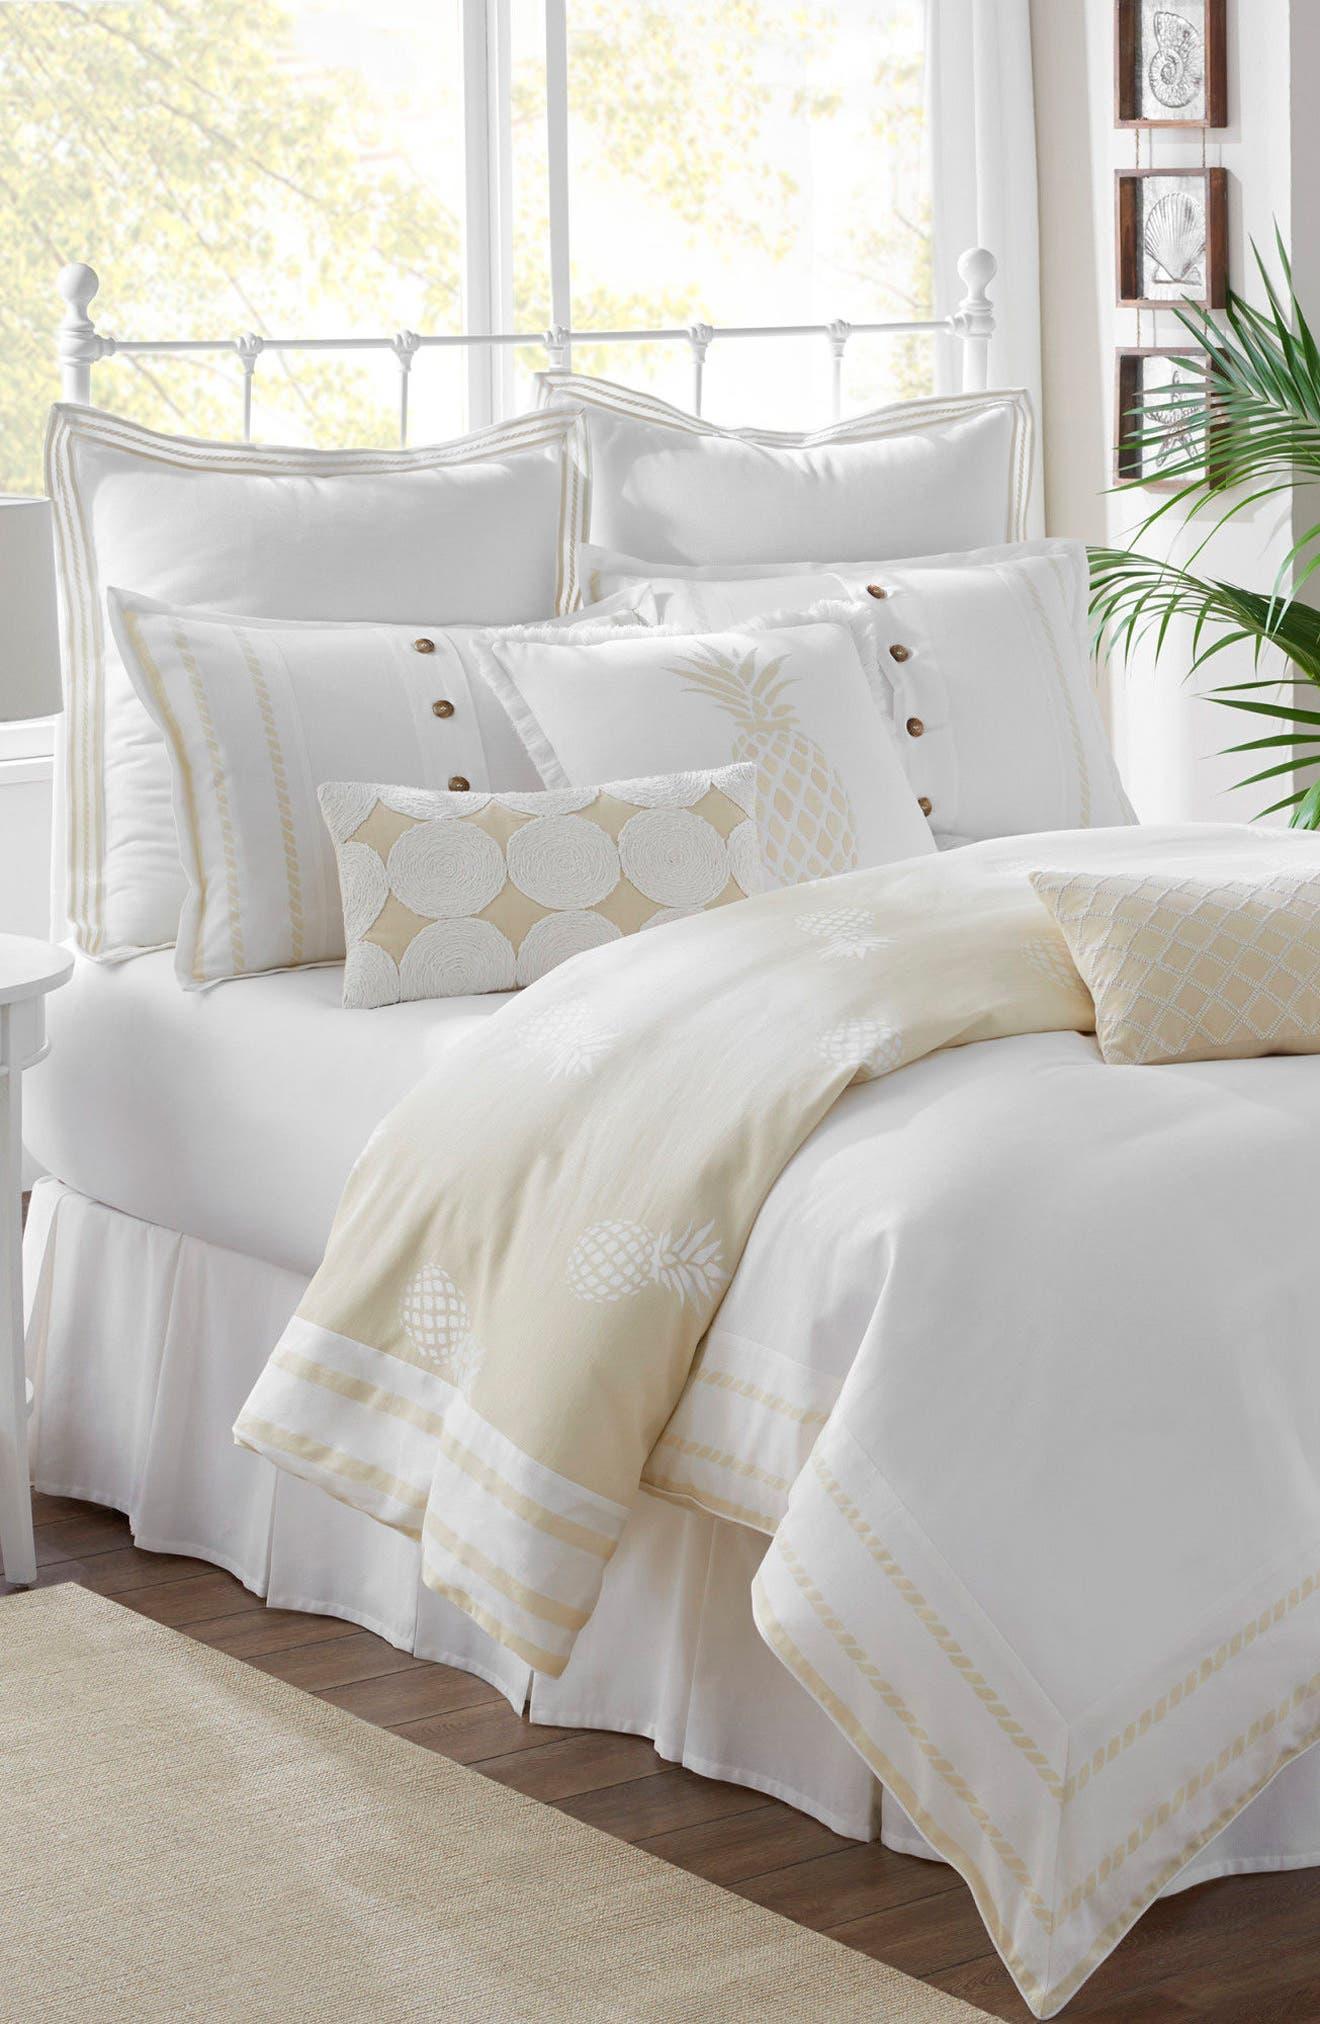 Southern Hospitality Comforter, Sham & Bed Skirt Set,                             Main thumbnail 1, color,                             250